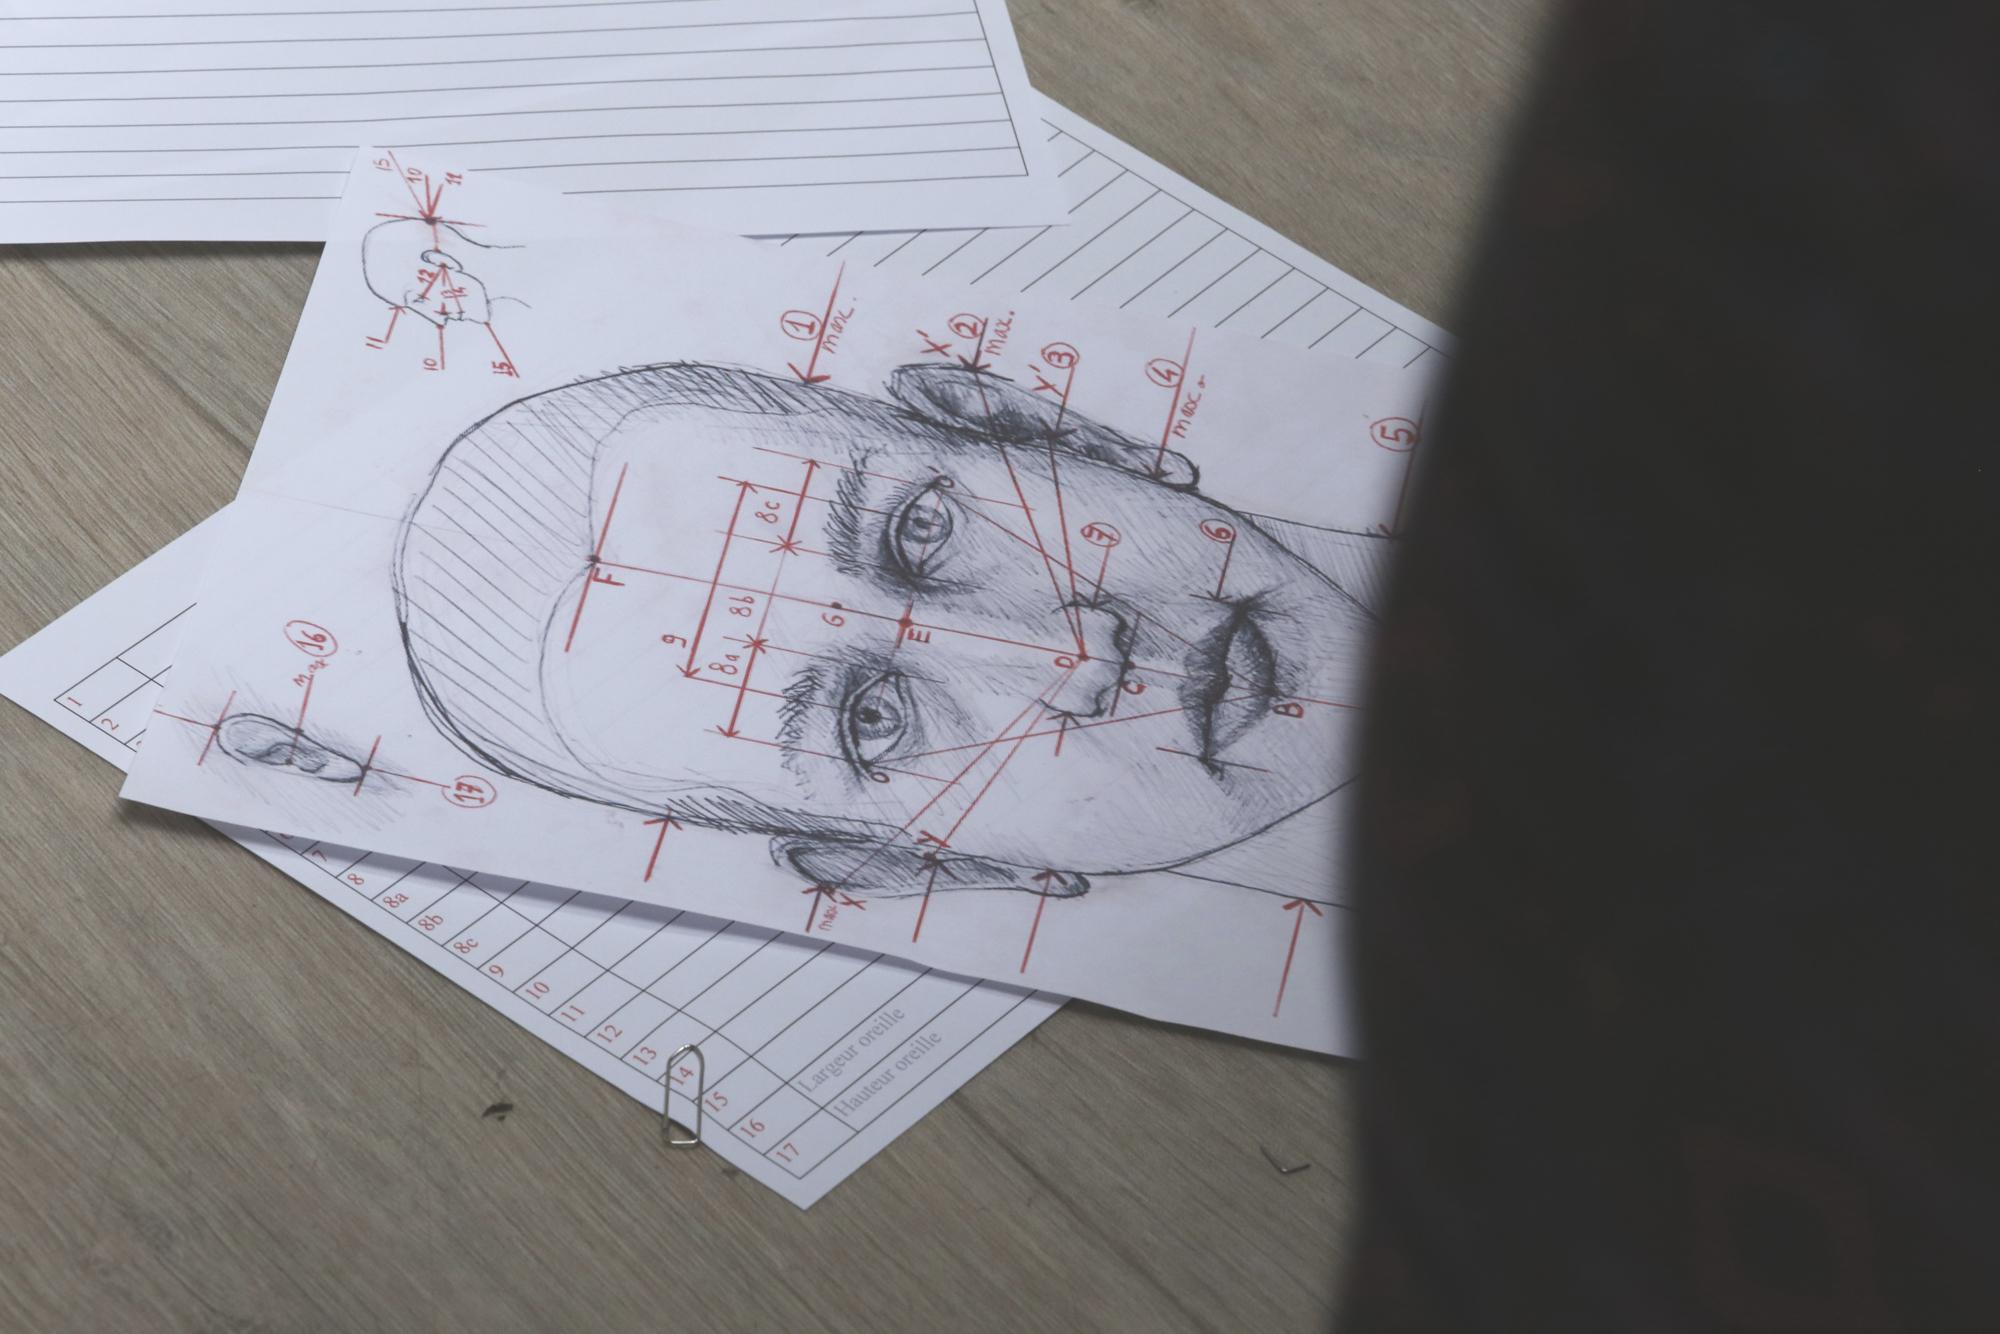 Zlatan Ibrahimovic - Measurements - Credit Musée Grévin